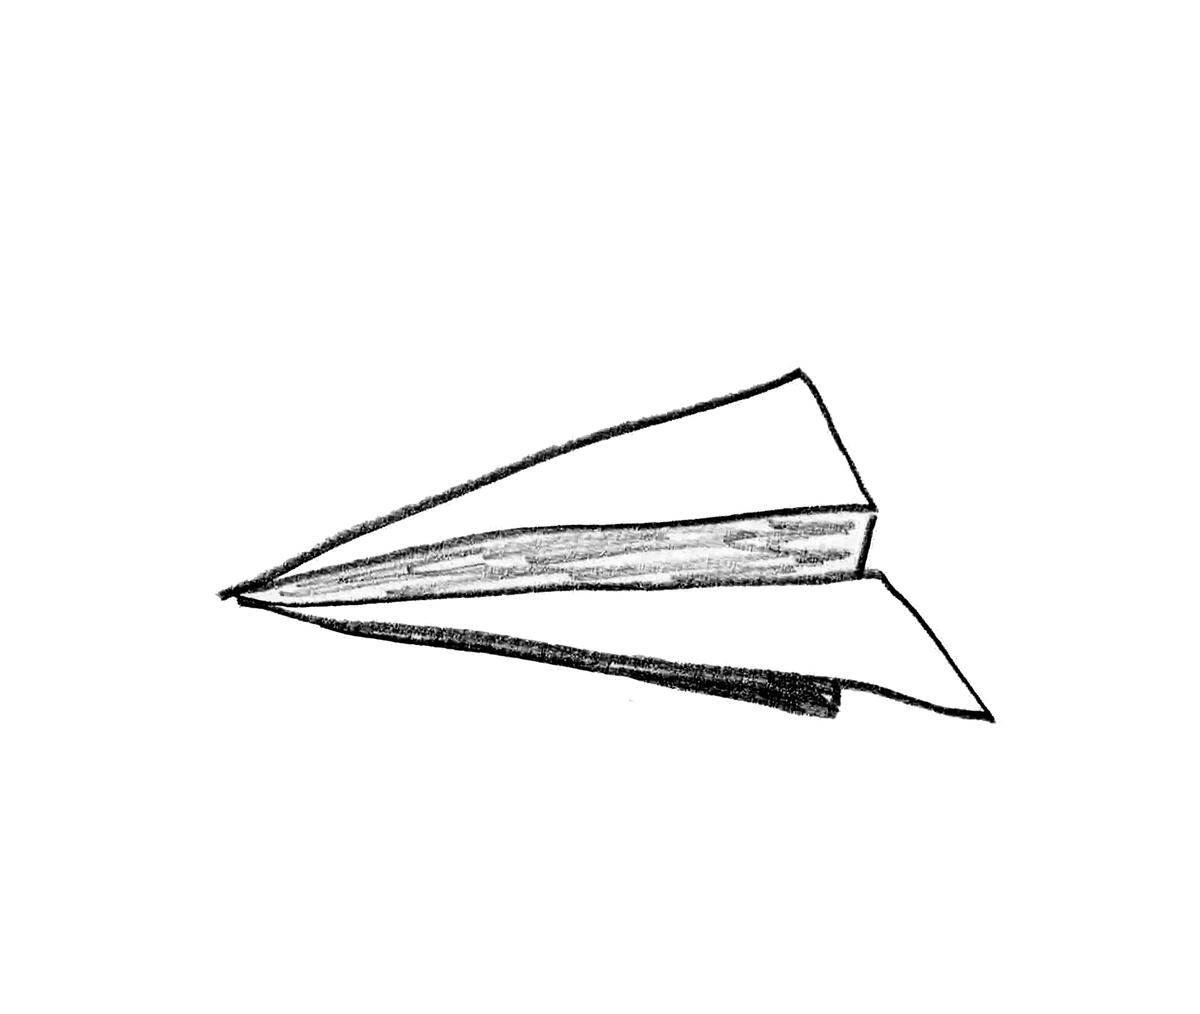 f:id:NarukawaShingo:20190402194511j:plain